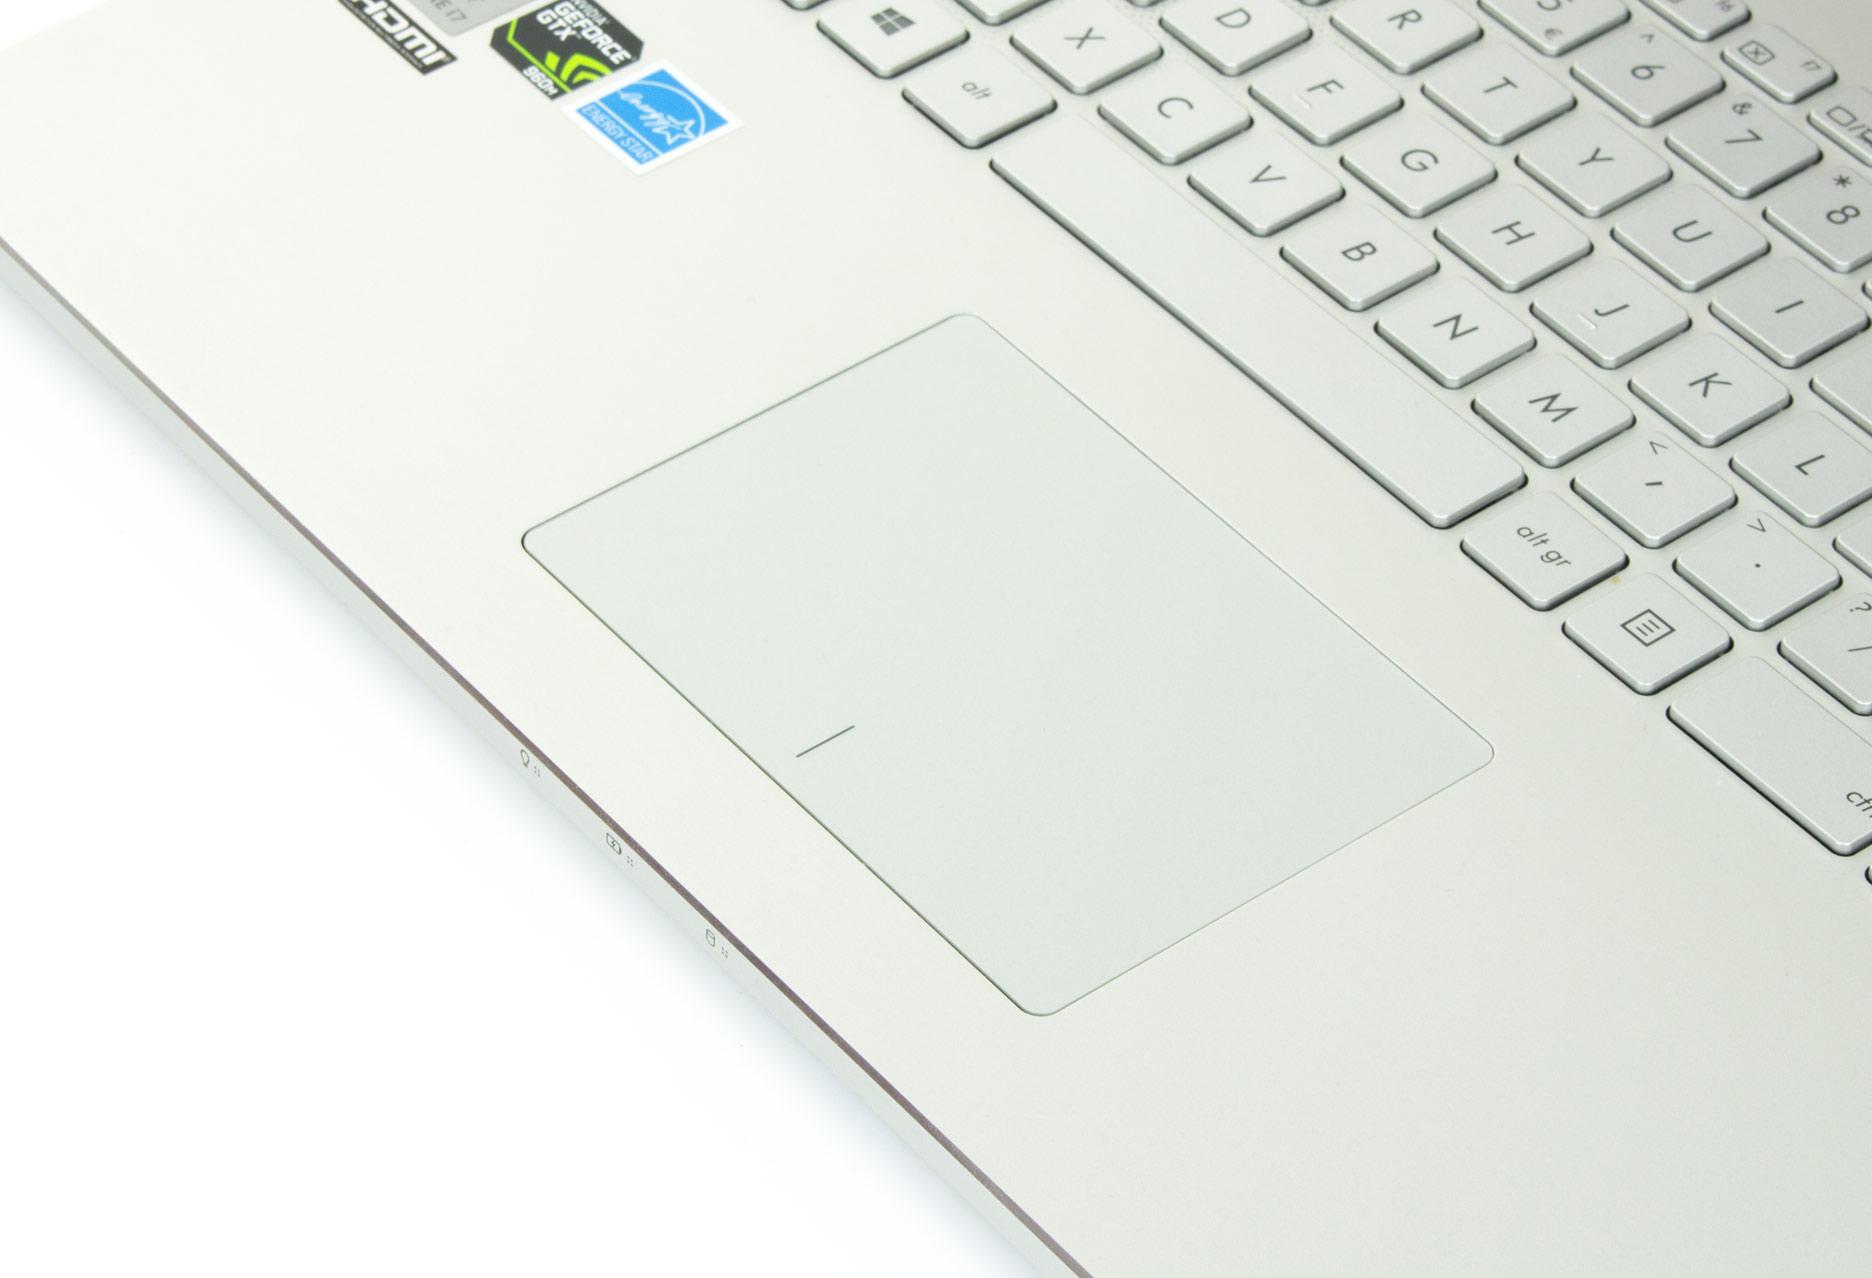 Asus Zenbook Pro UX501 touchpad